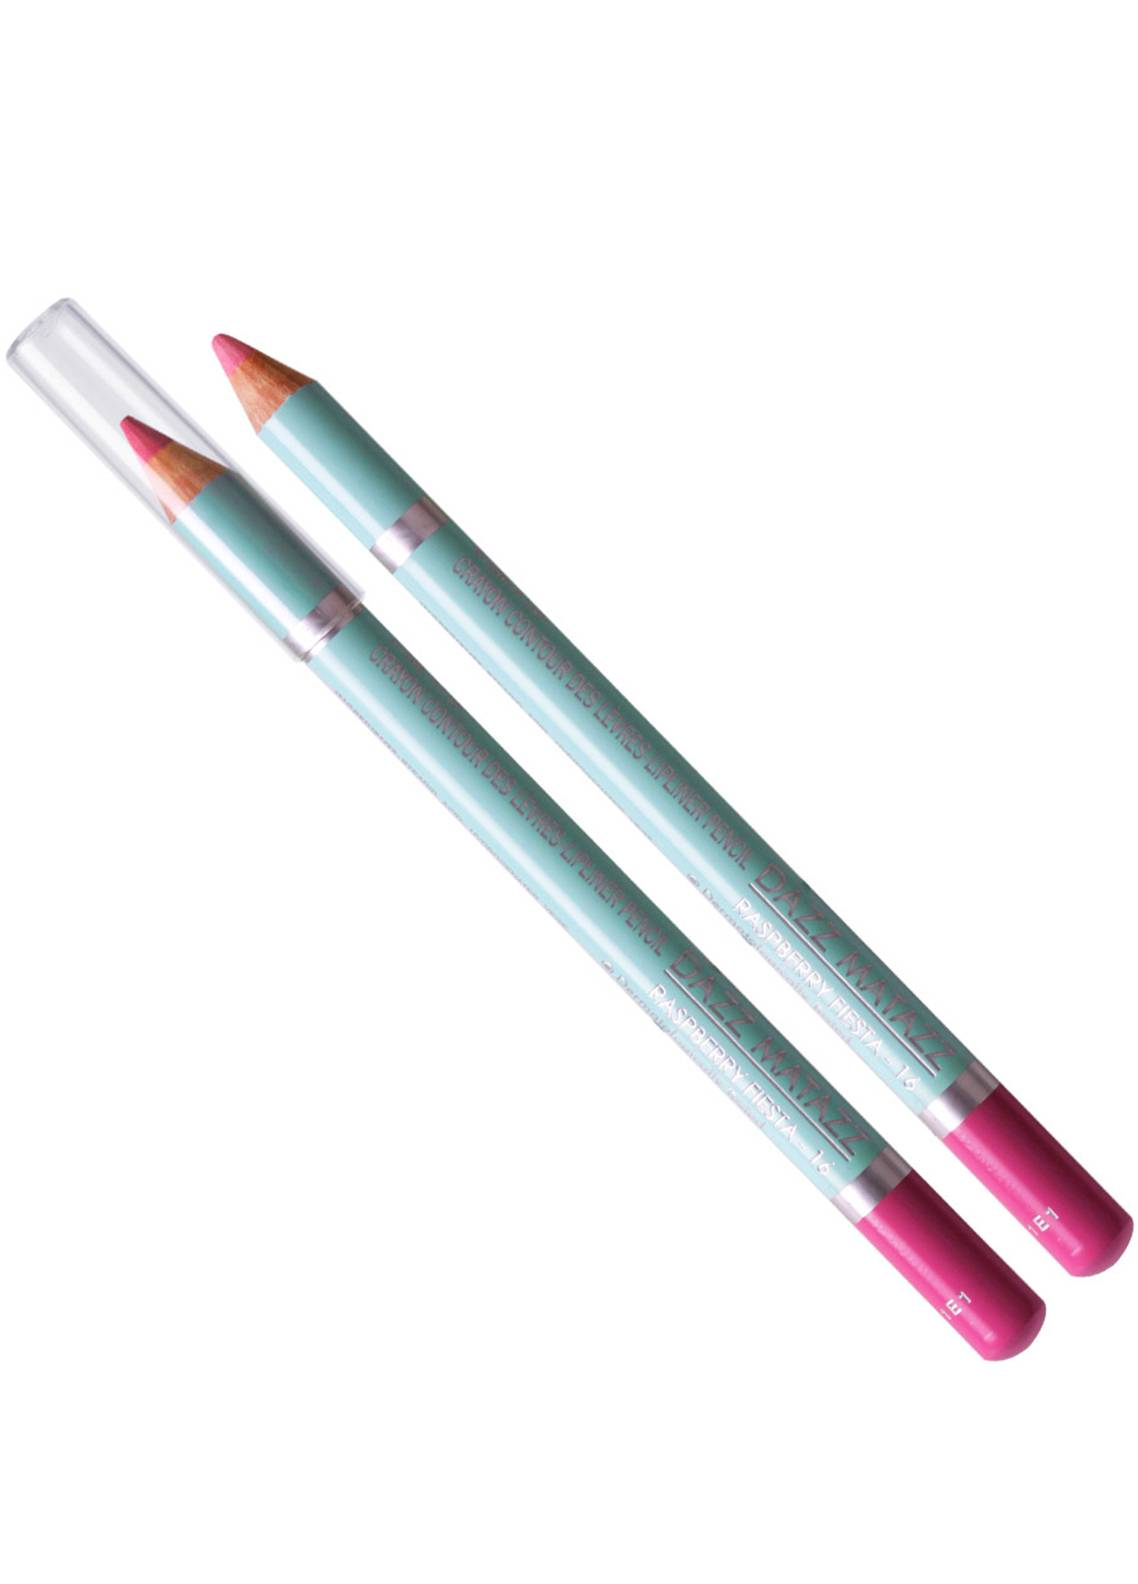 Dazz Matazz Lip Liner Pencil-16 RASPBERRY FIESTA